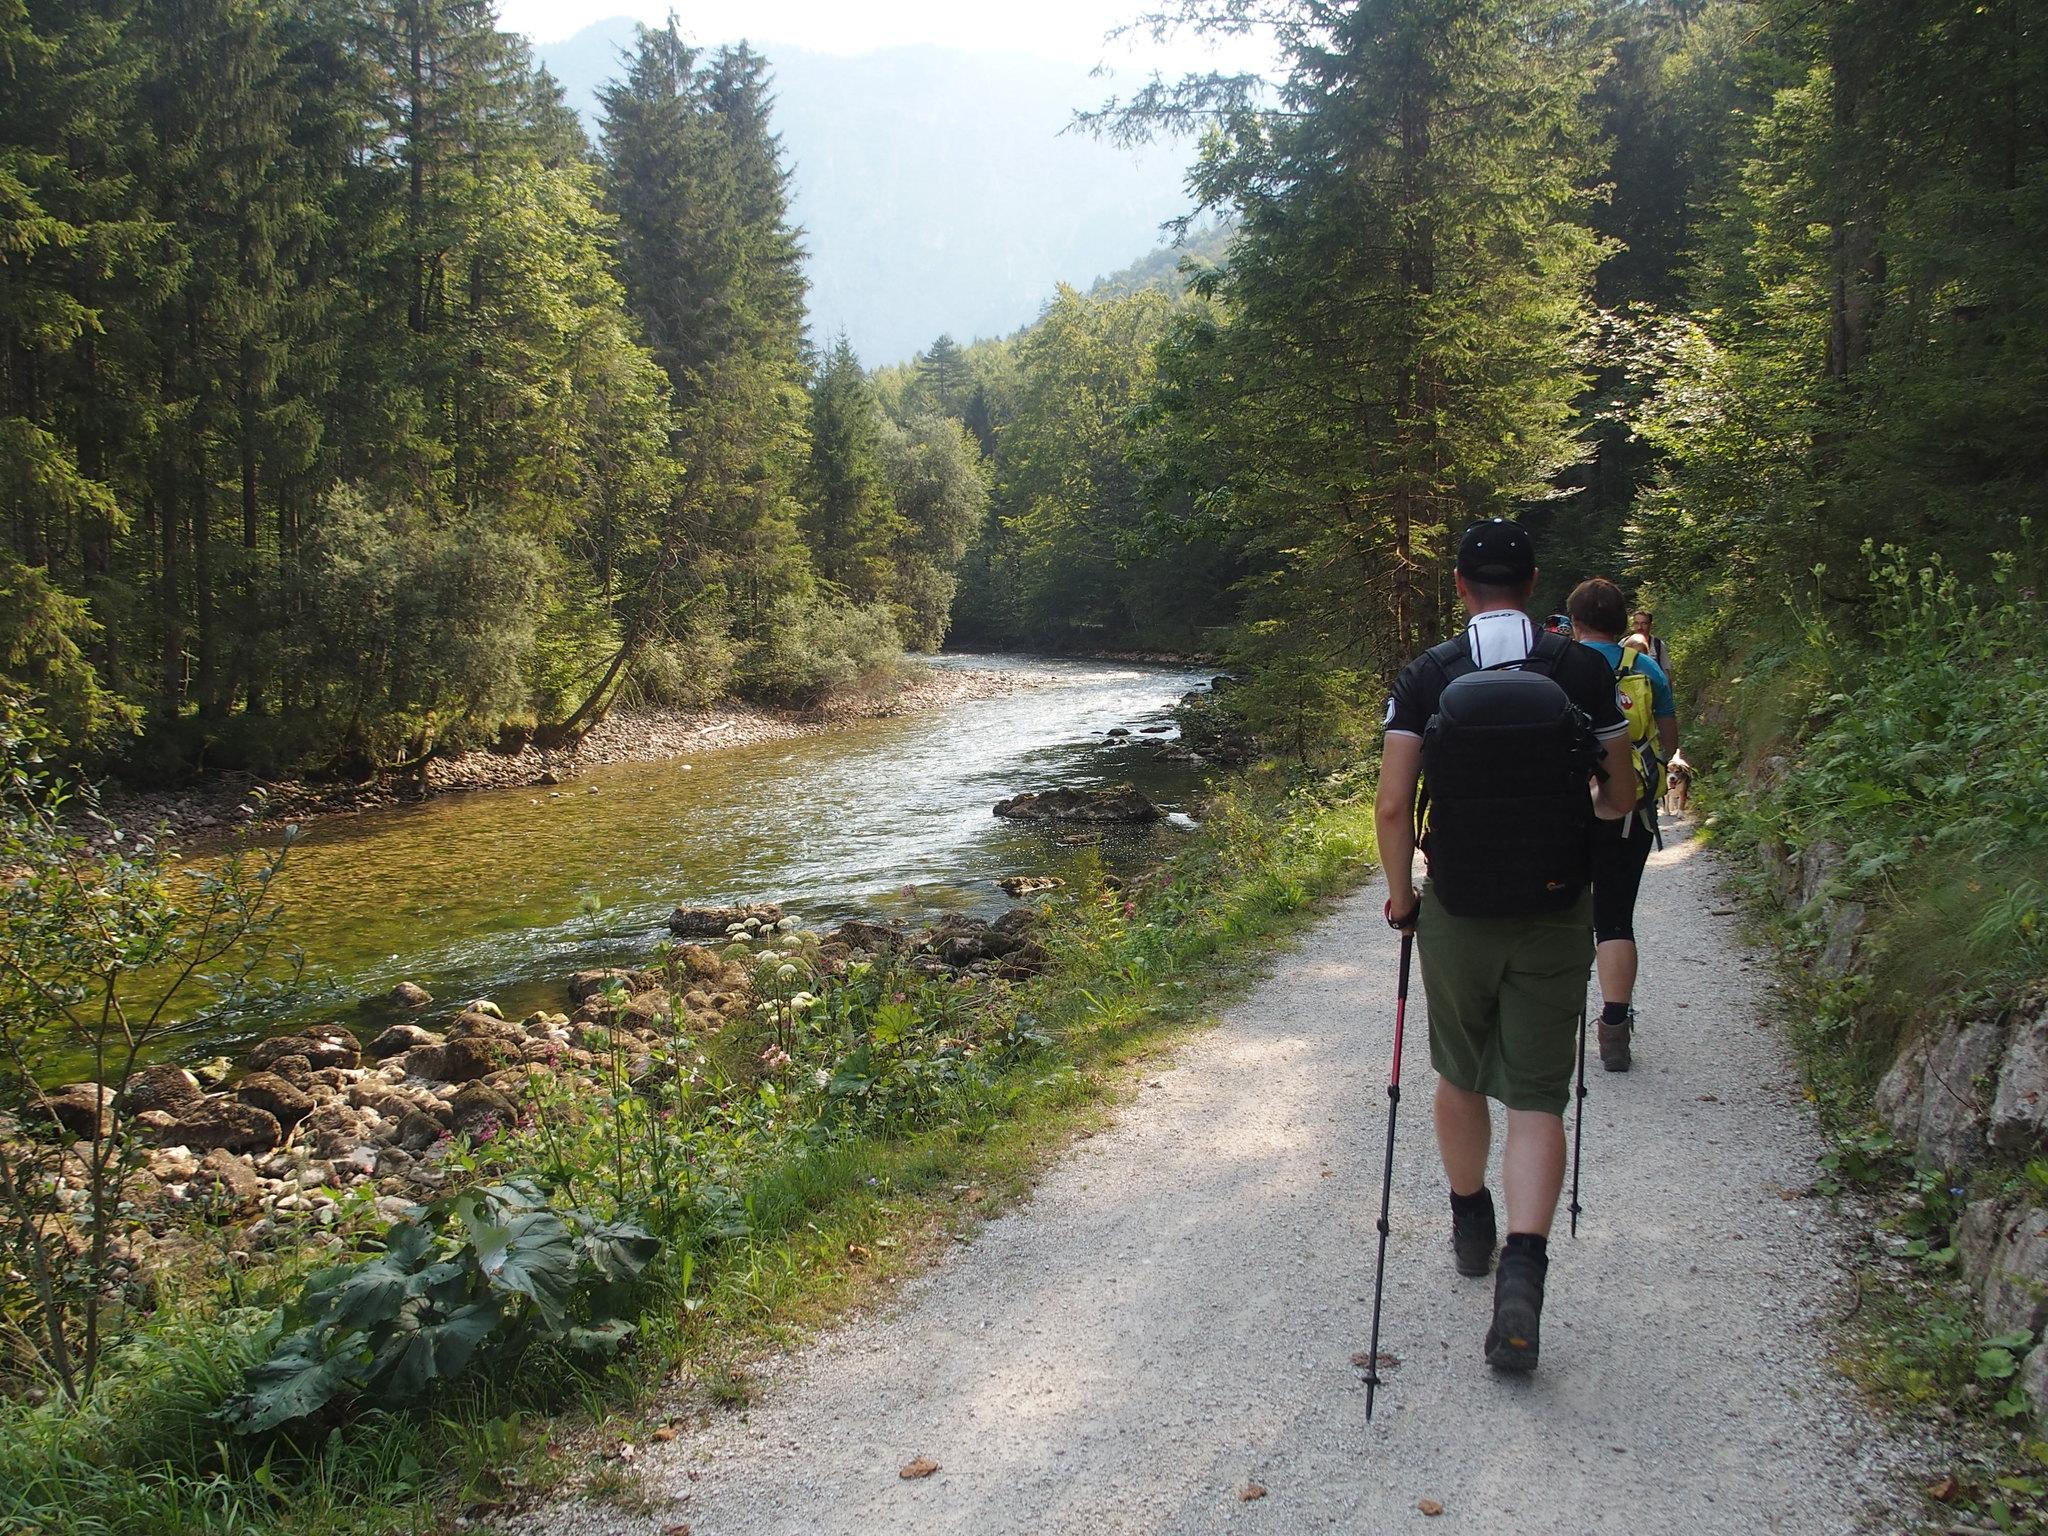 Flod vandrare